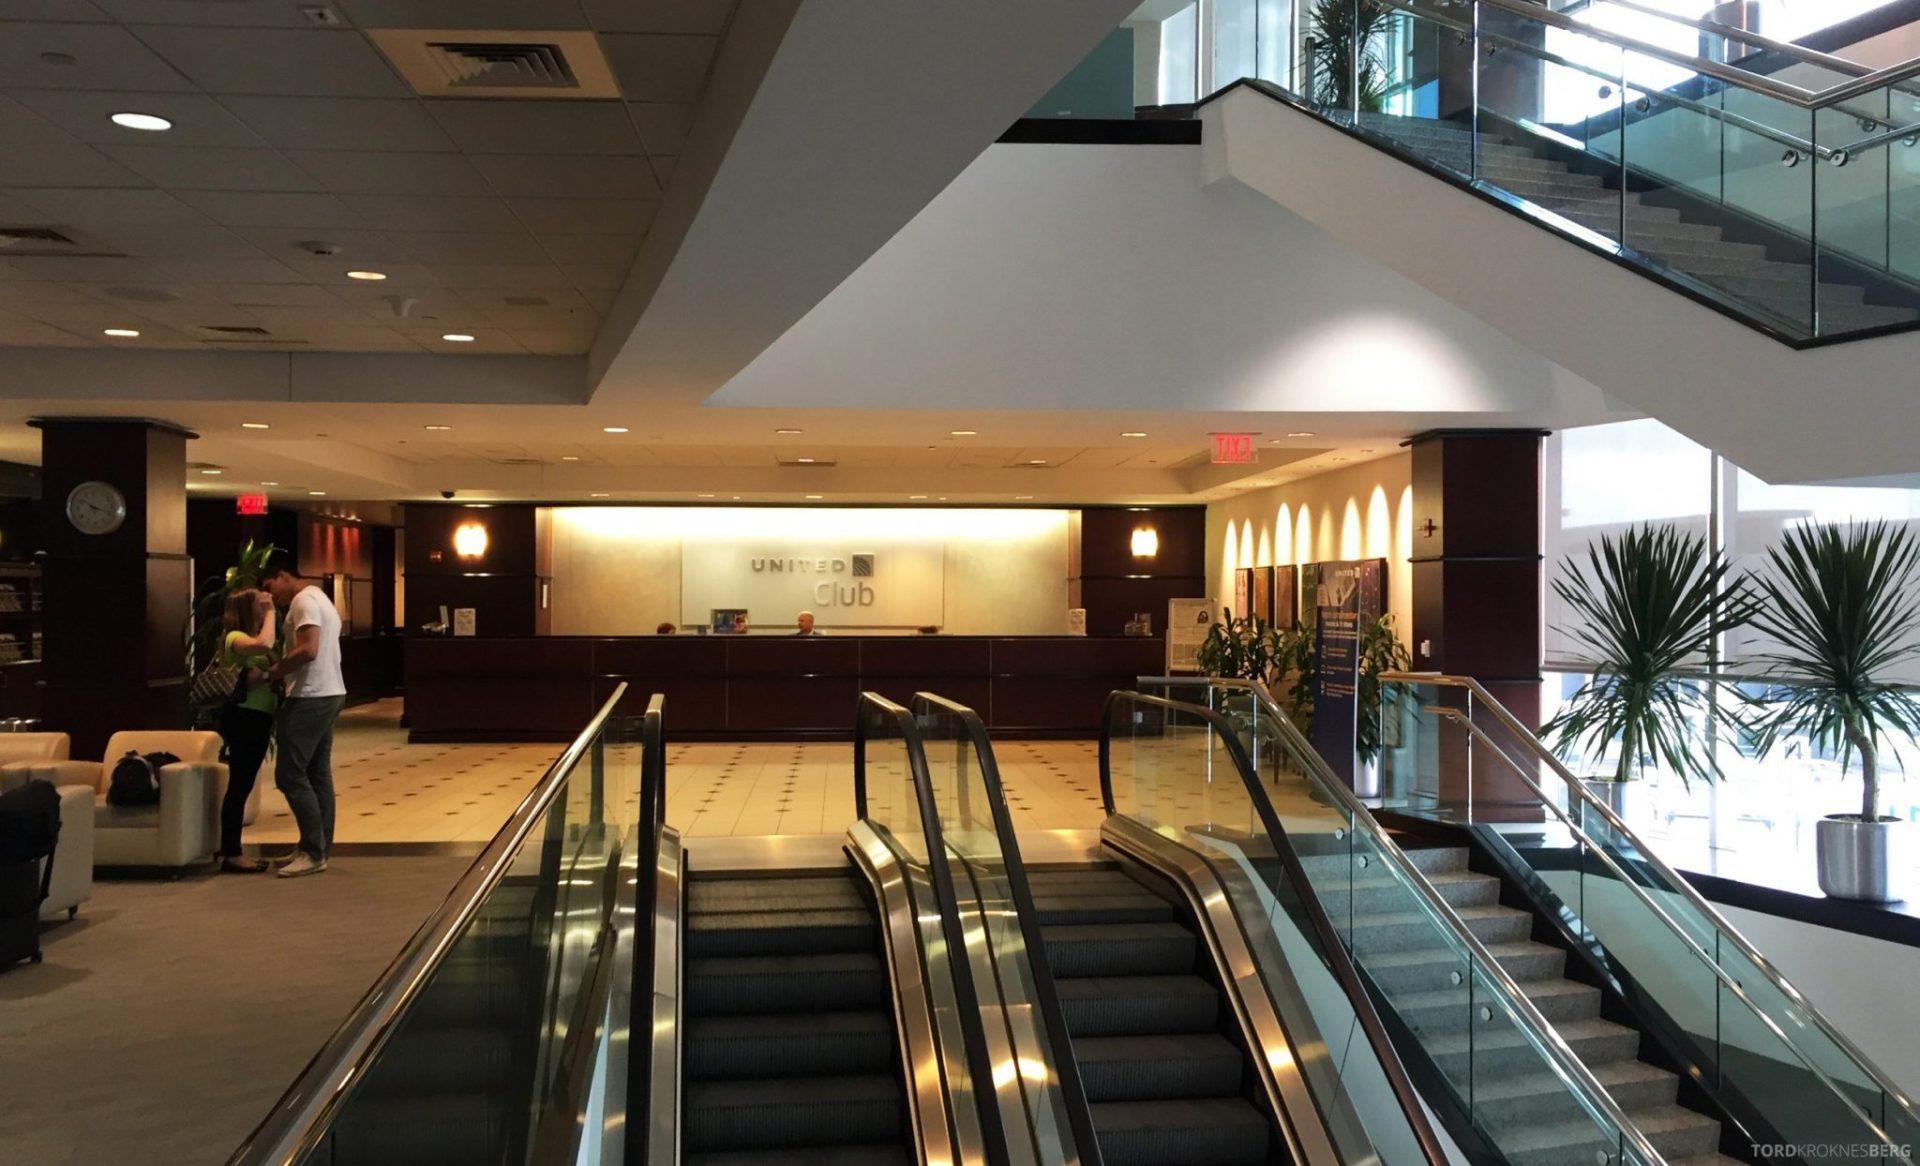 United Club Lounge Houston resepsjon